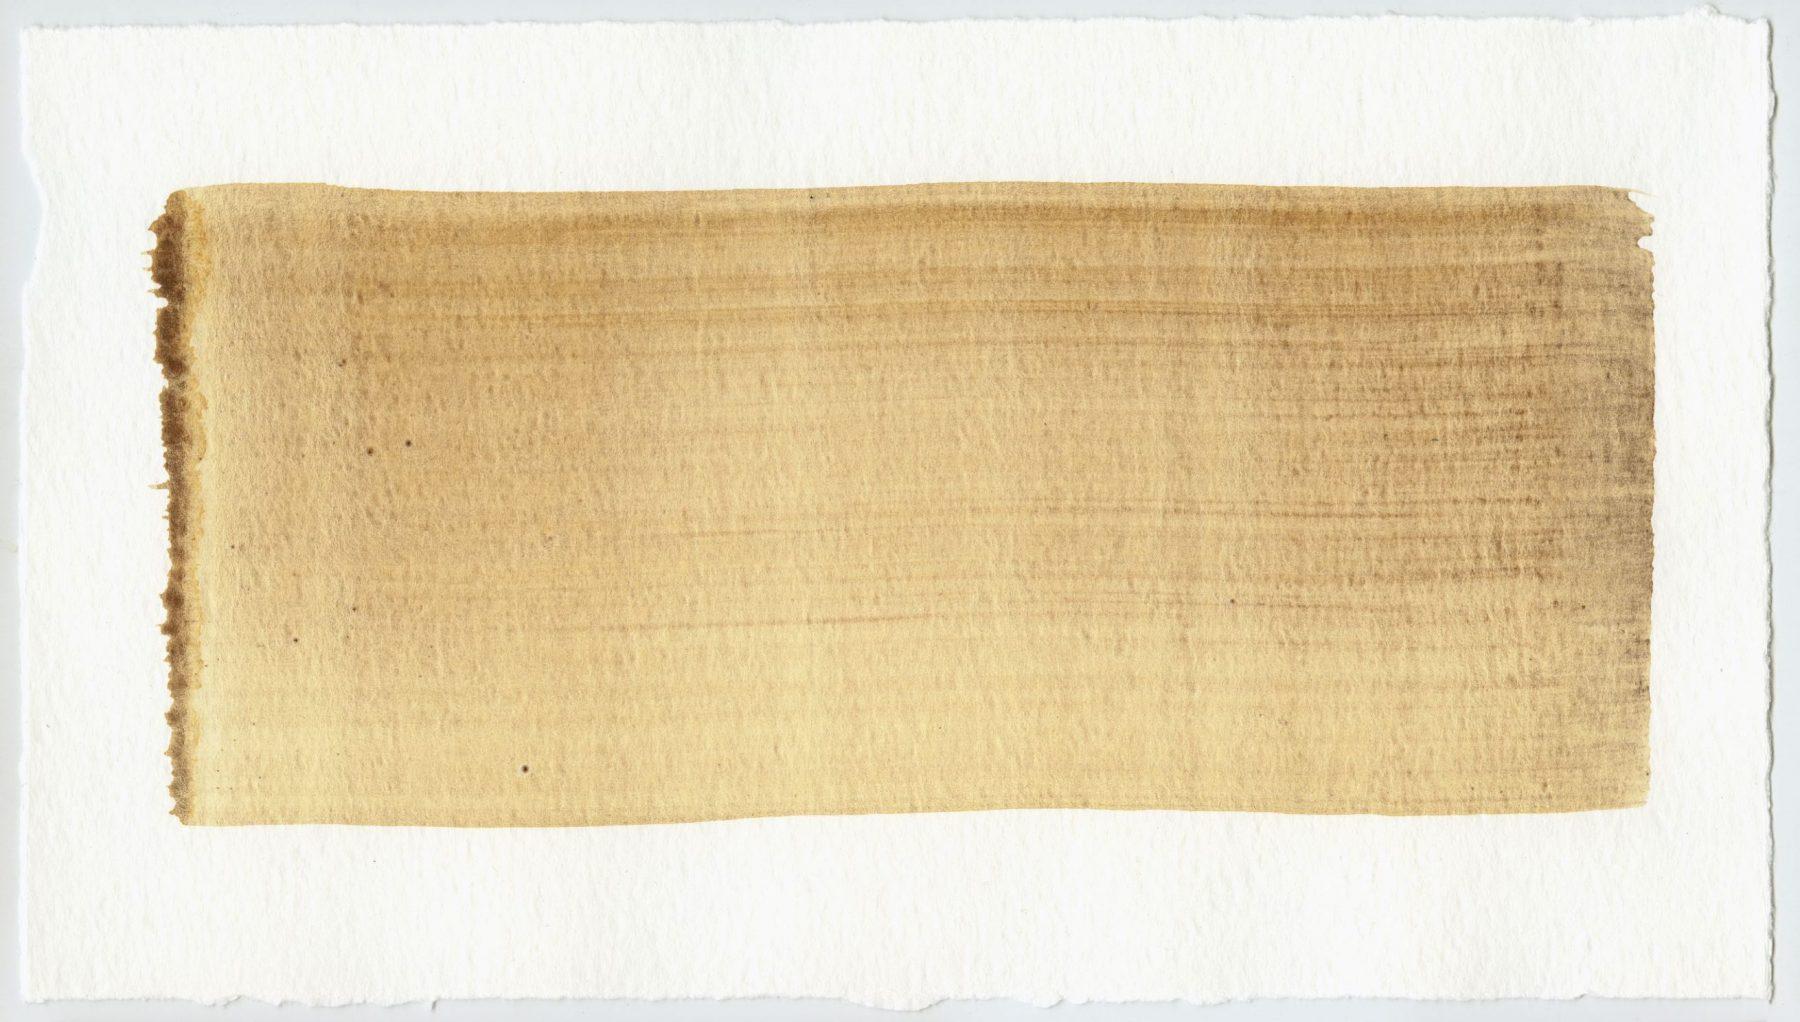 Brush stroke no. 81 - Selfmade pigment: IJzeroer